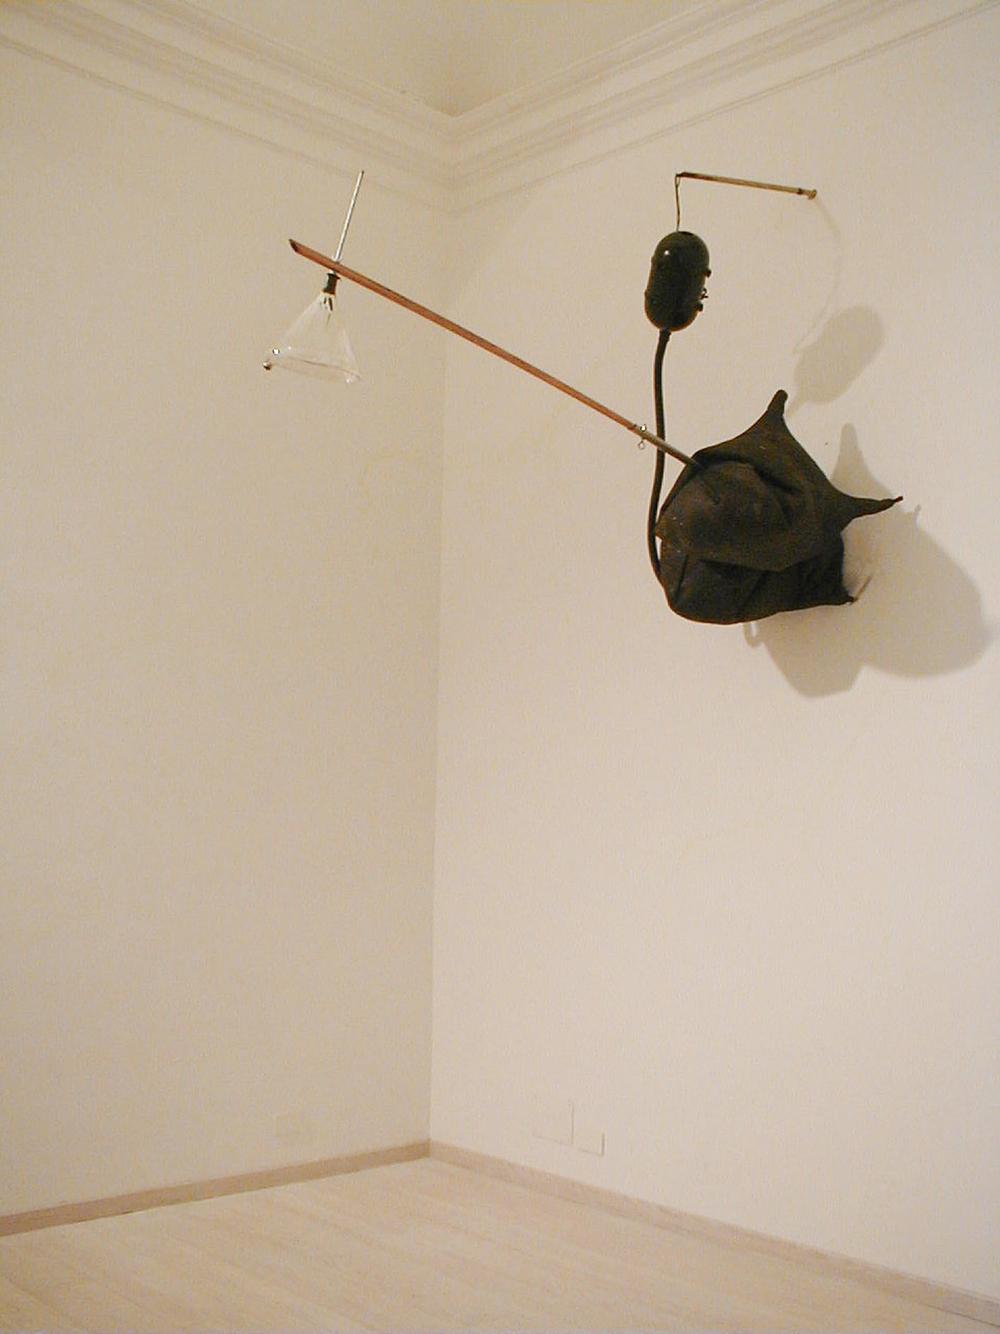 L'agguato, 2002, 4 marrani, inox, rame, pirex, fosforo, due motori, timer, muro, cm 480x150x60